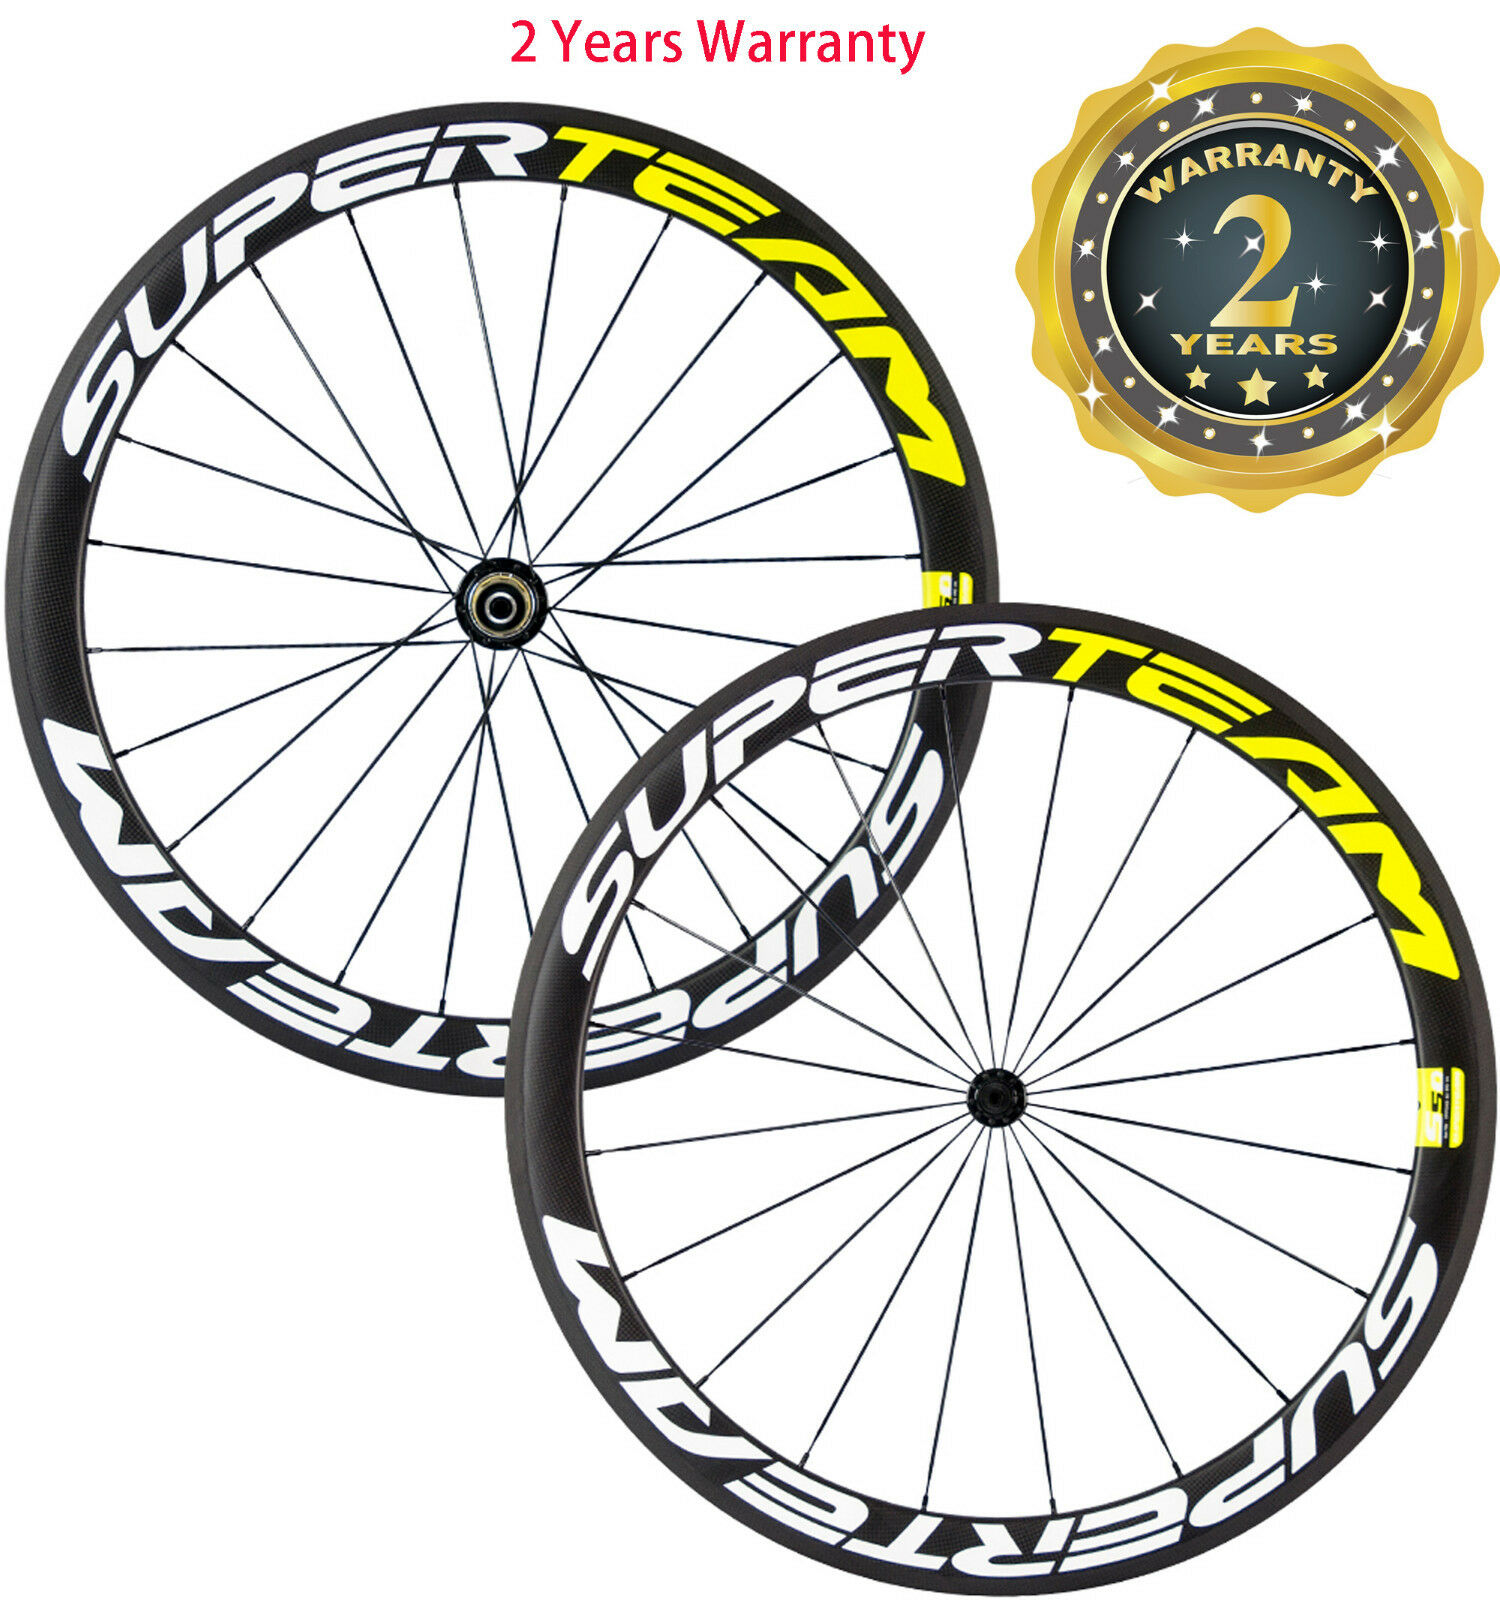 Superteam 50mm Depth Road Bike Wheels Carbon Wheelset  Bicycle Front&Rear Wheels  guaranteed